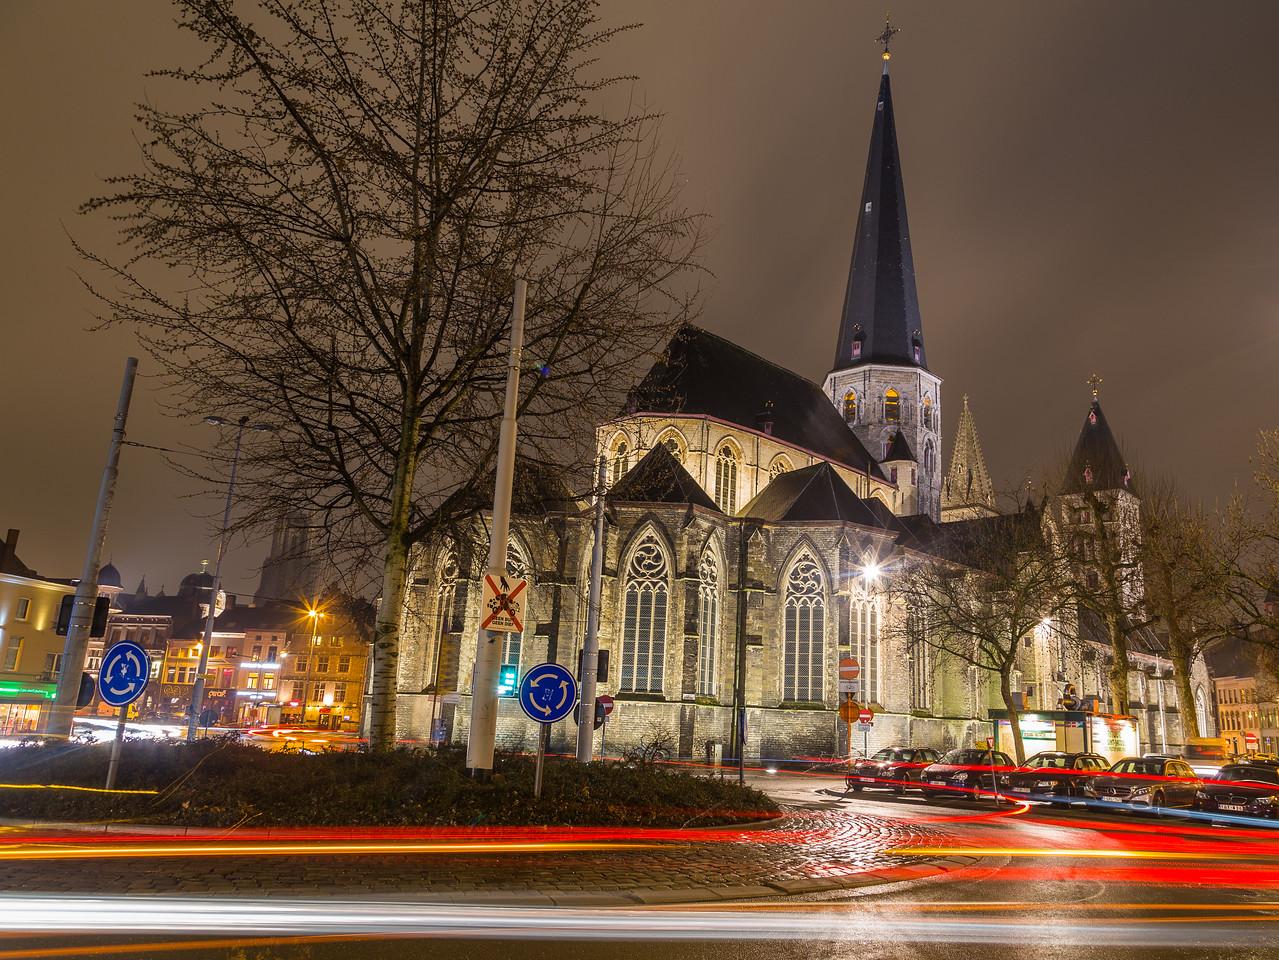 St. James' Church, Antwerp (Sint-Jacobskerk) in Ghent at Night